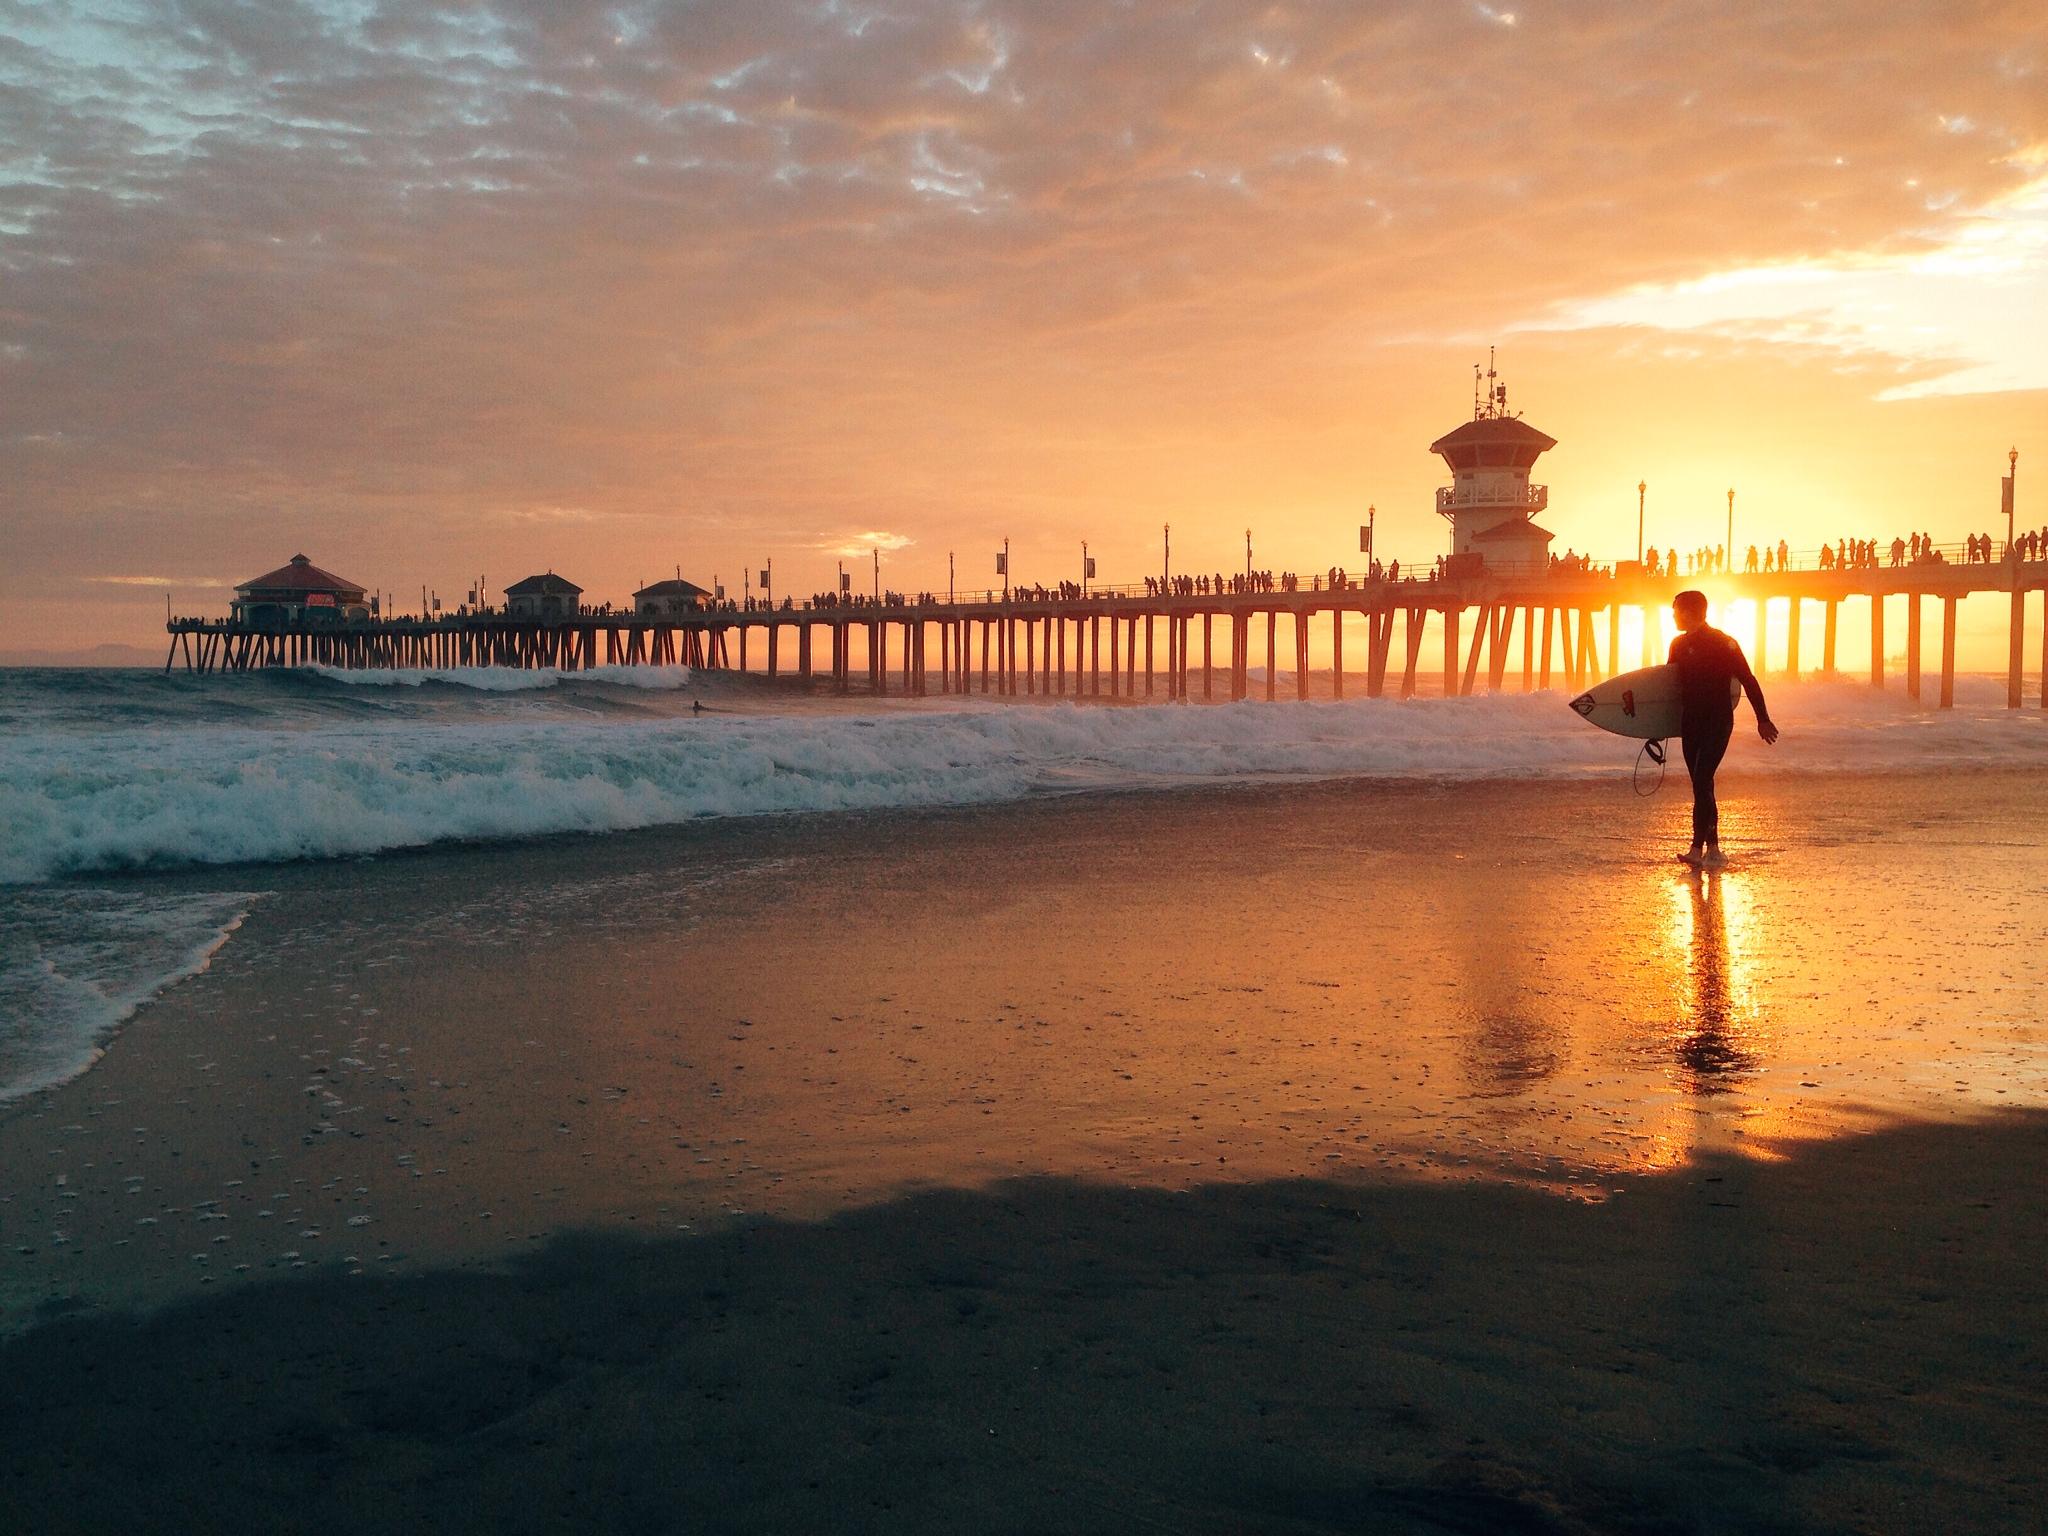 Surfer_at_Huntington_Beach_Pier.jpg